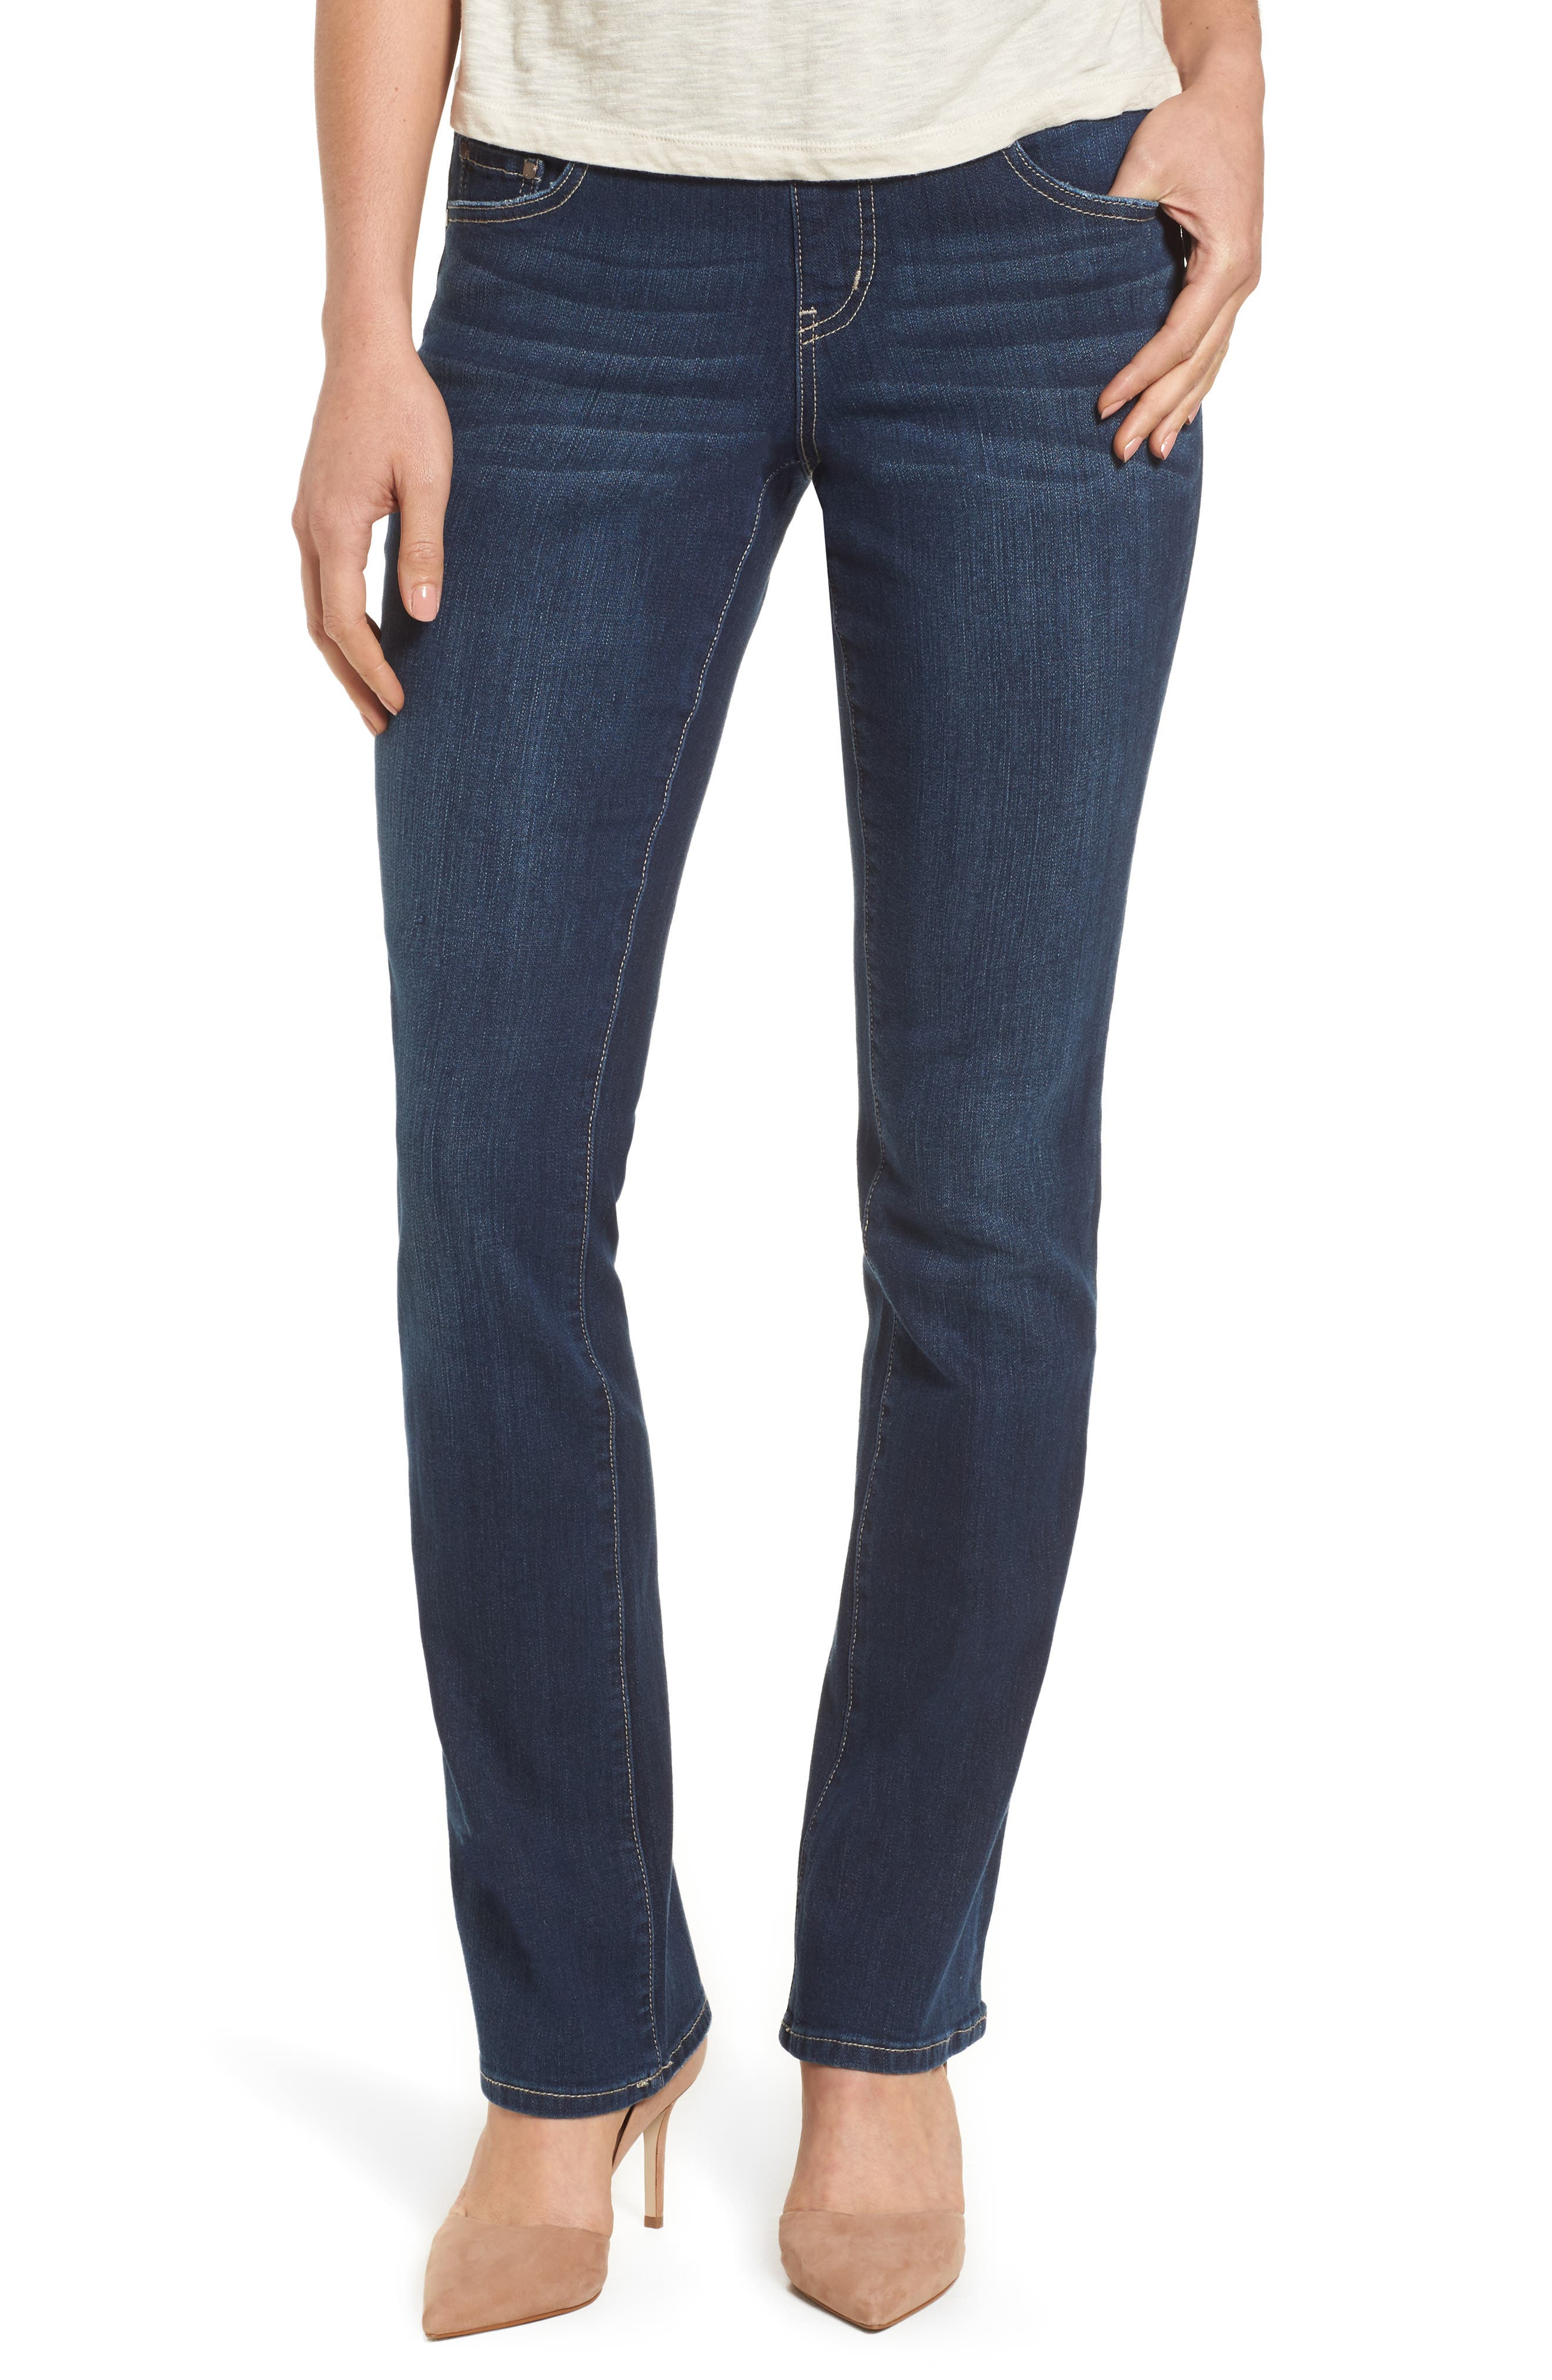 Paley Stretch Bootcut Jeans,                         Main,                         color, Dark Indigo